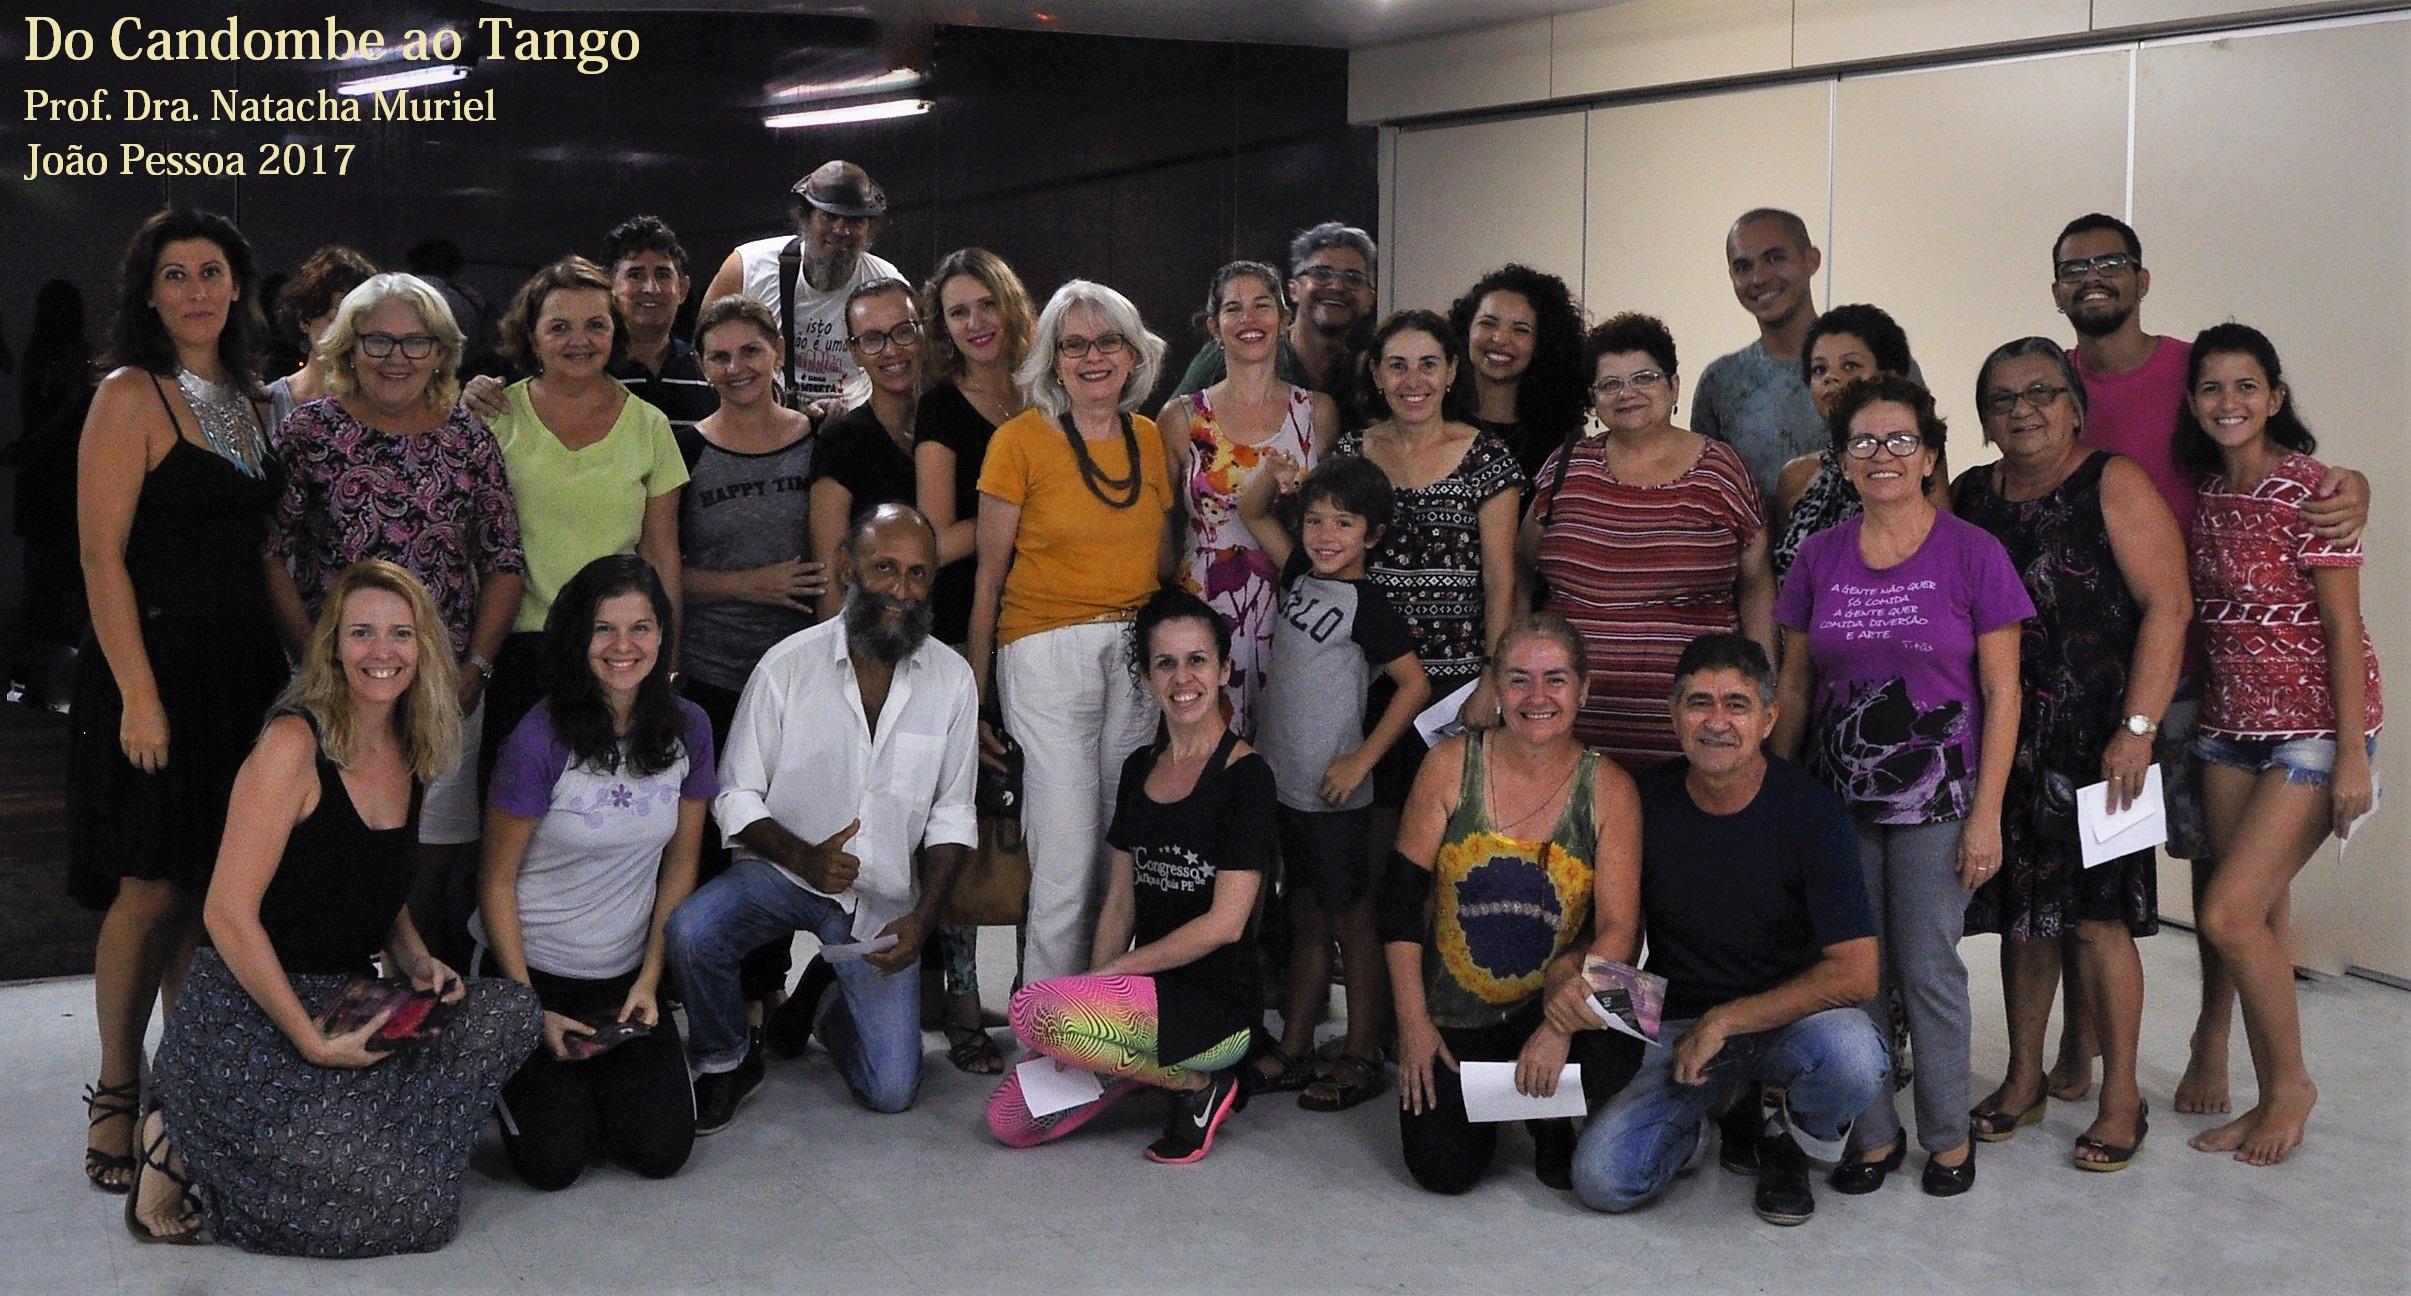 Do candombe ao tango (1)